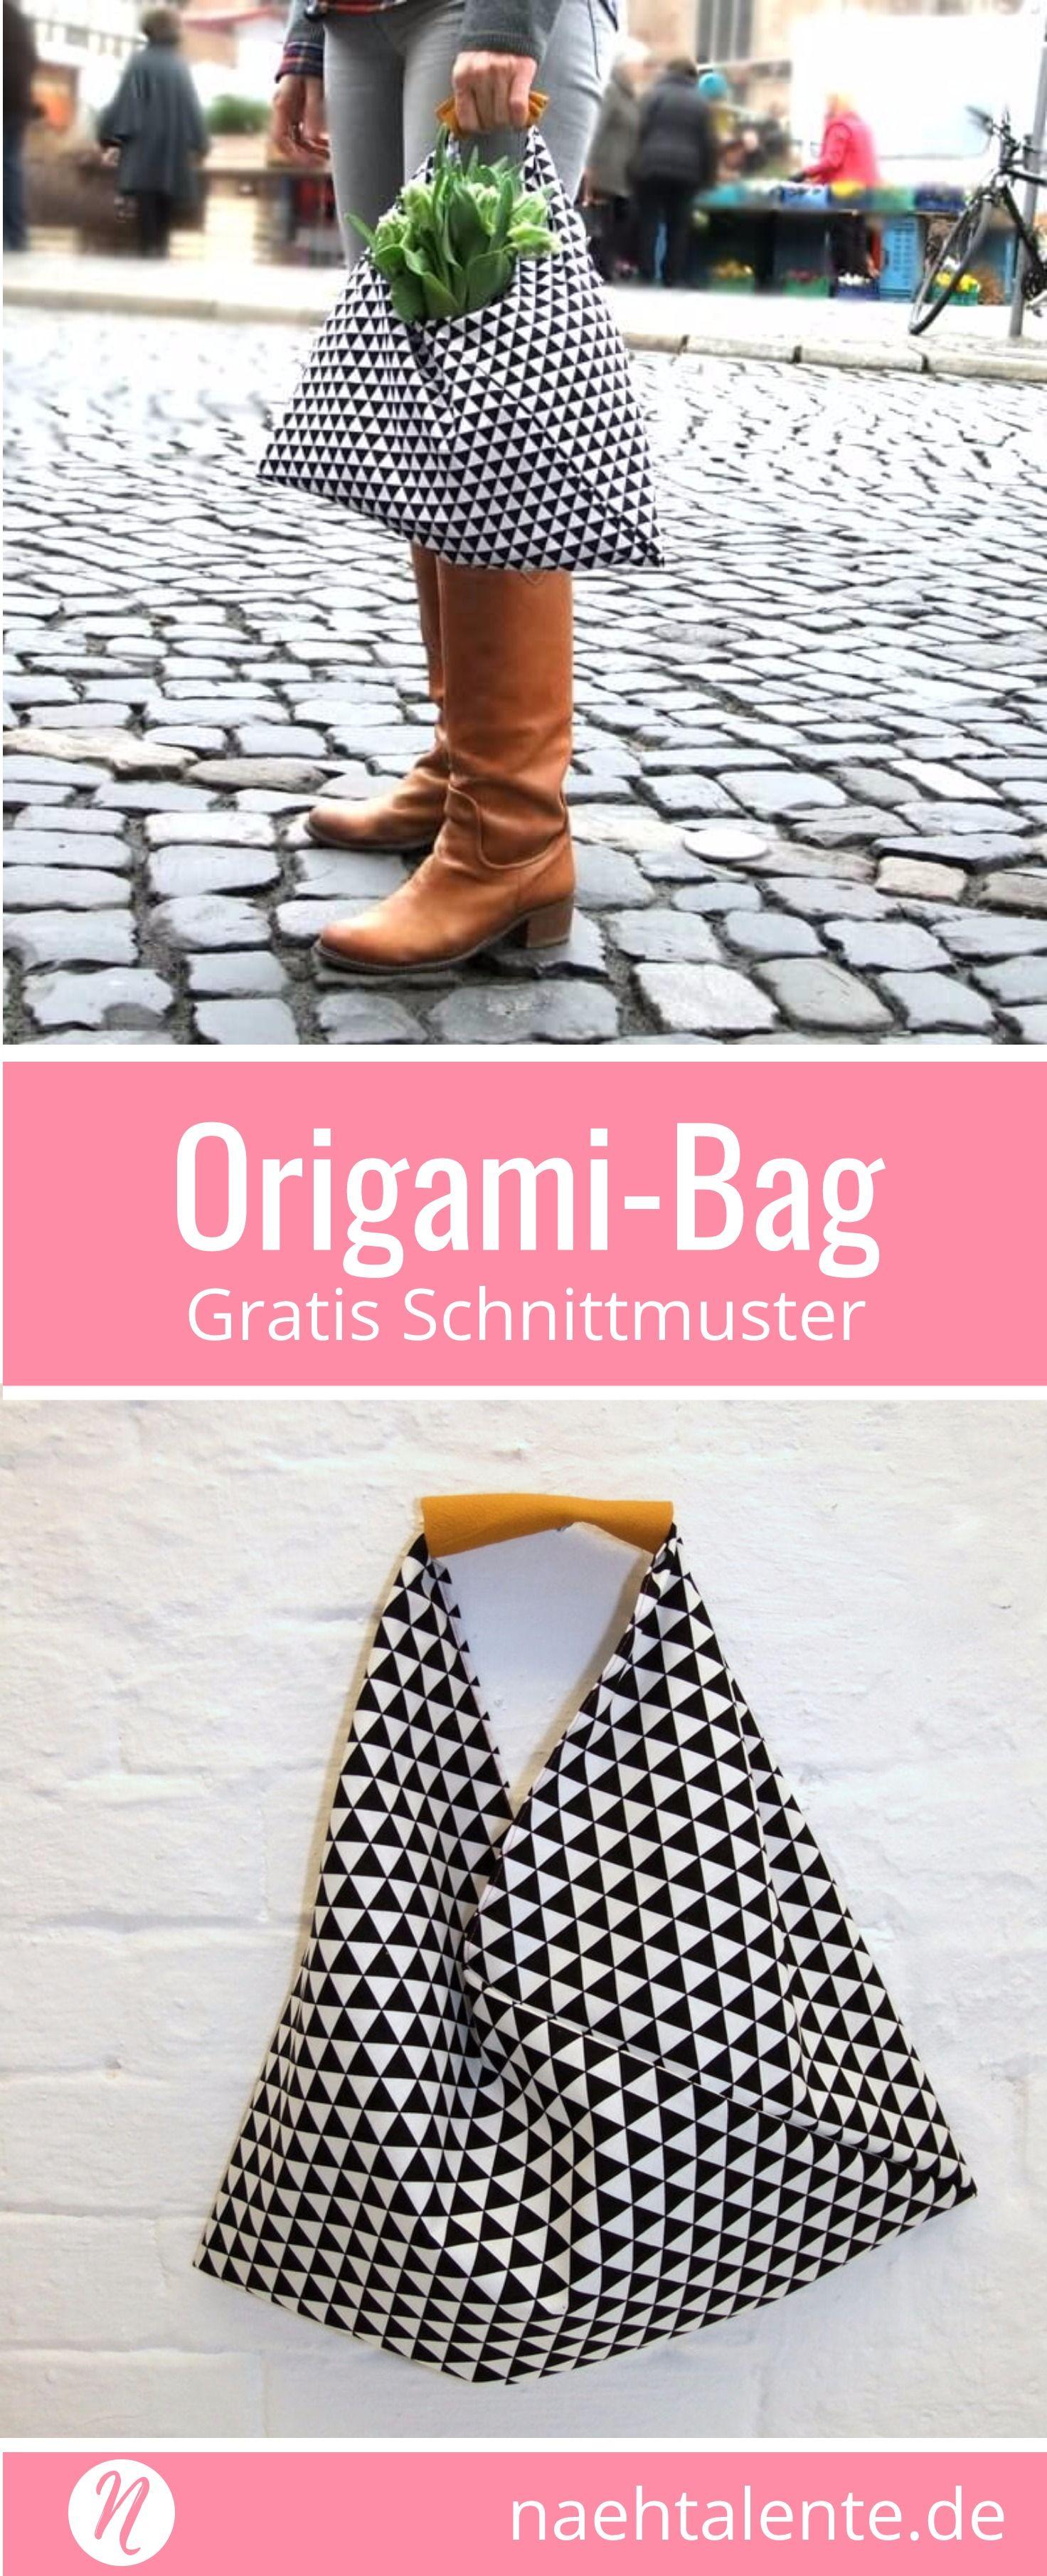 Origami-Bag - genäht in nur 30 Minuten | Pinterest | Origami-tasche ...